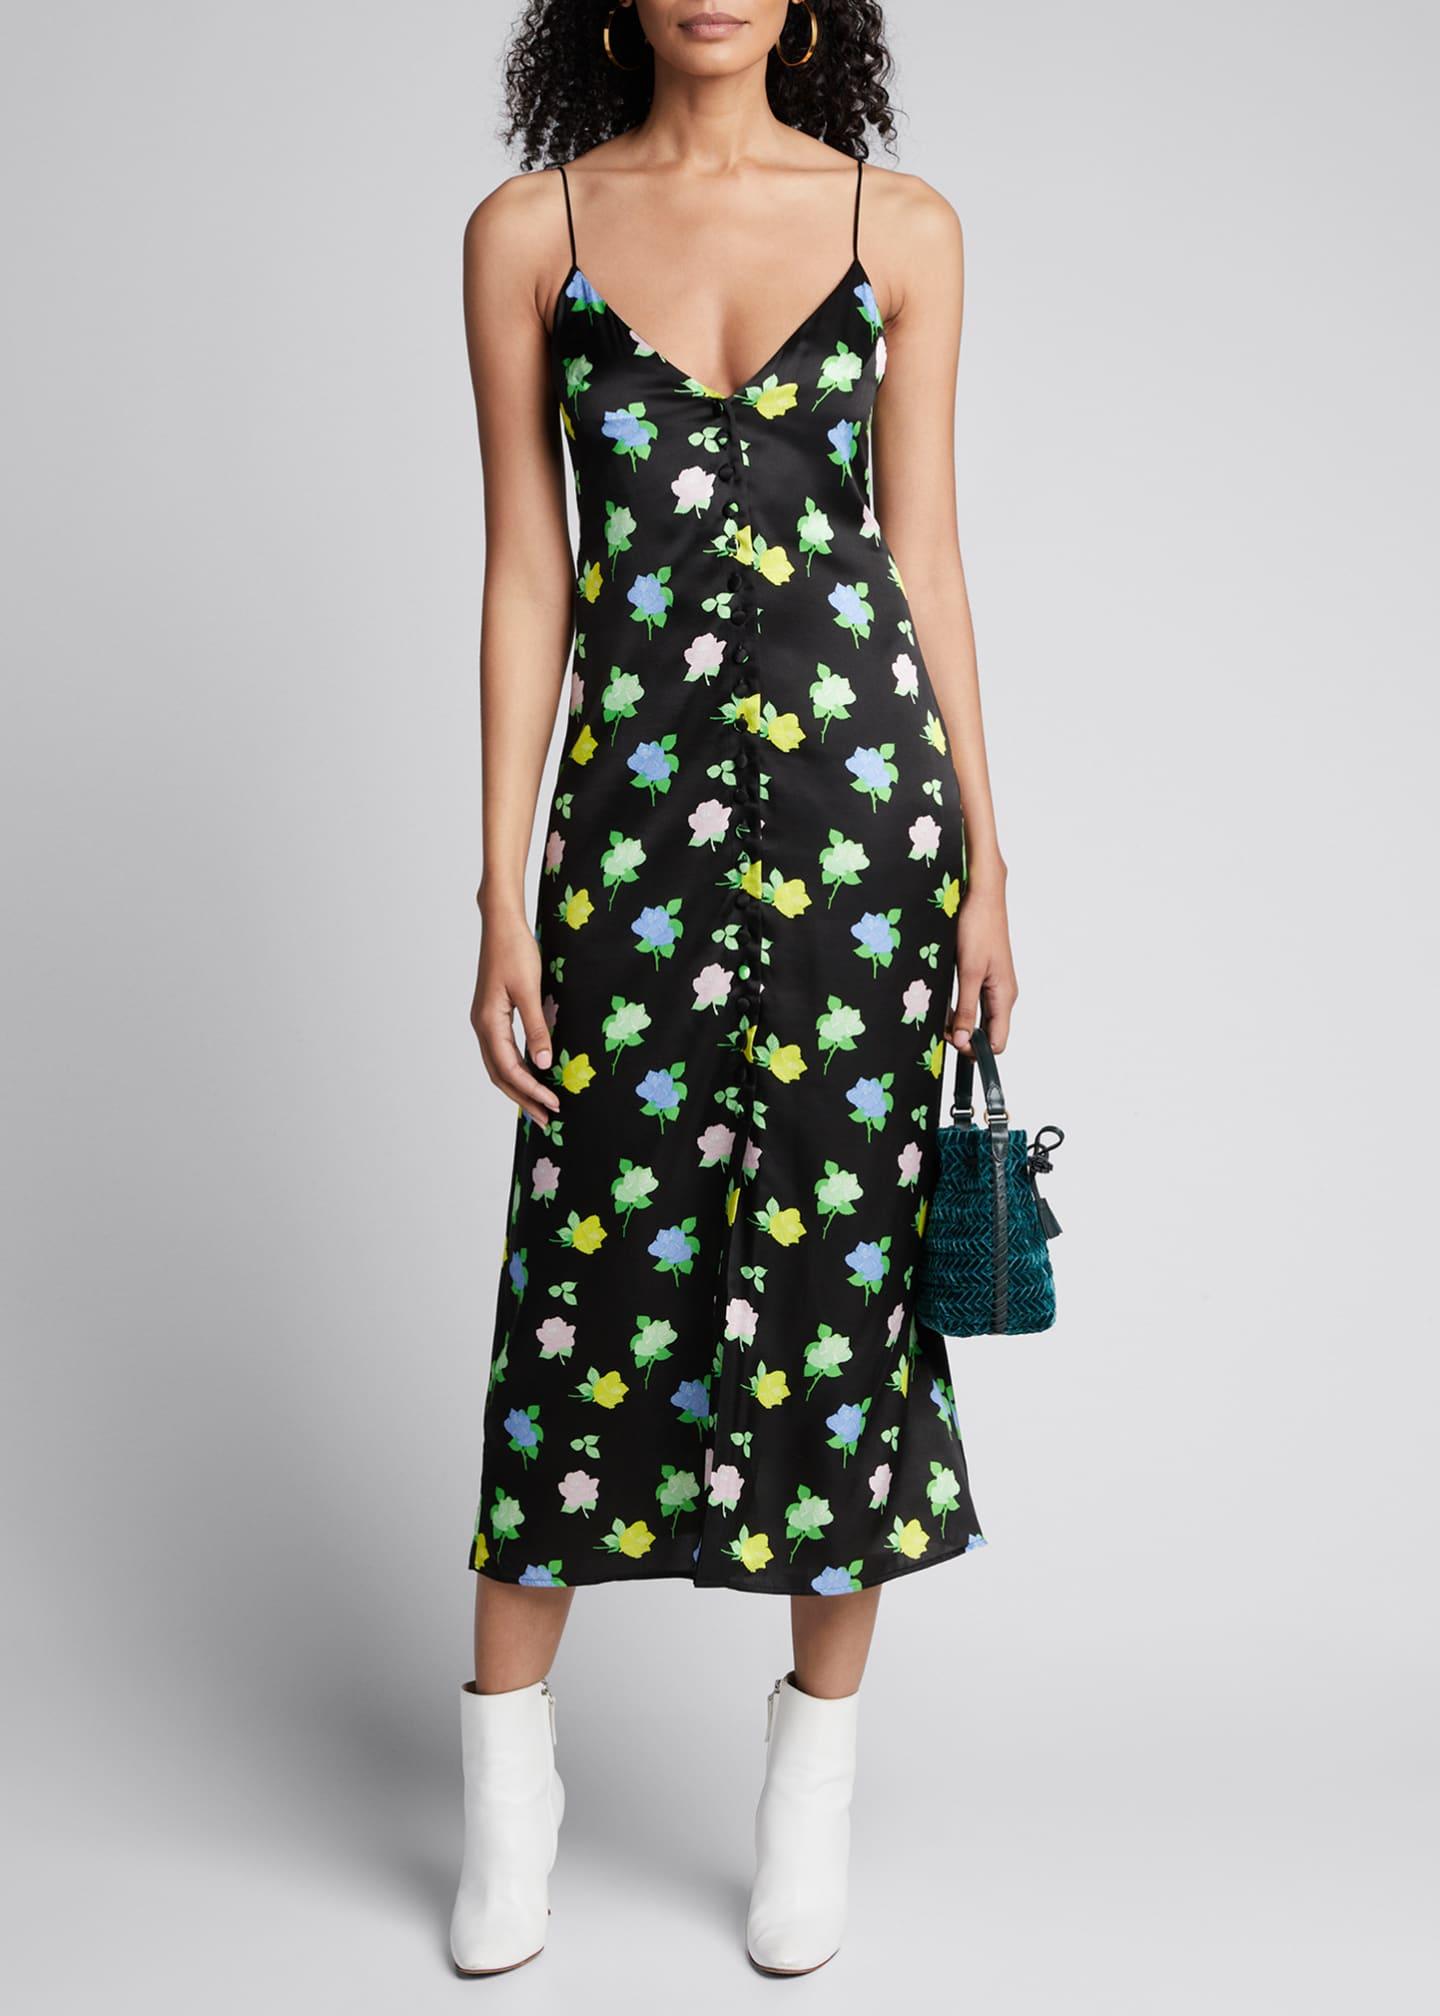 BERNADETTE Hailey Mini Rose-Print Satin Button-Front Slip Dress